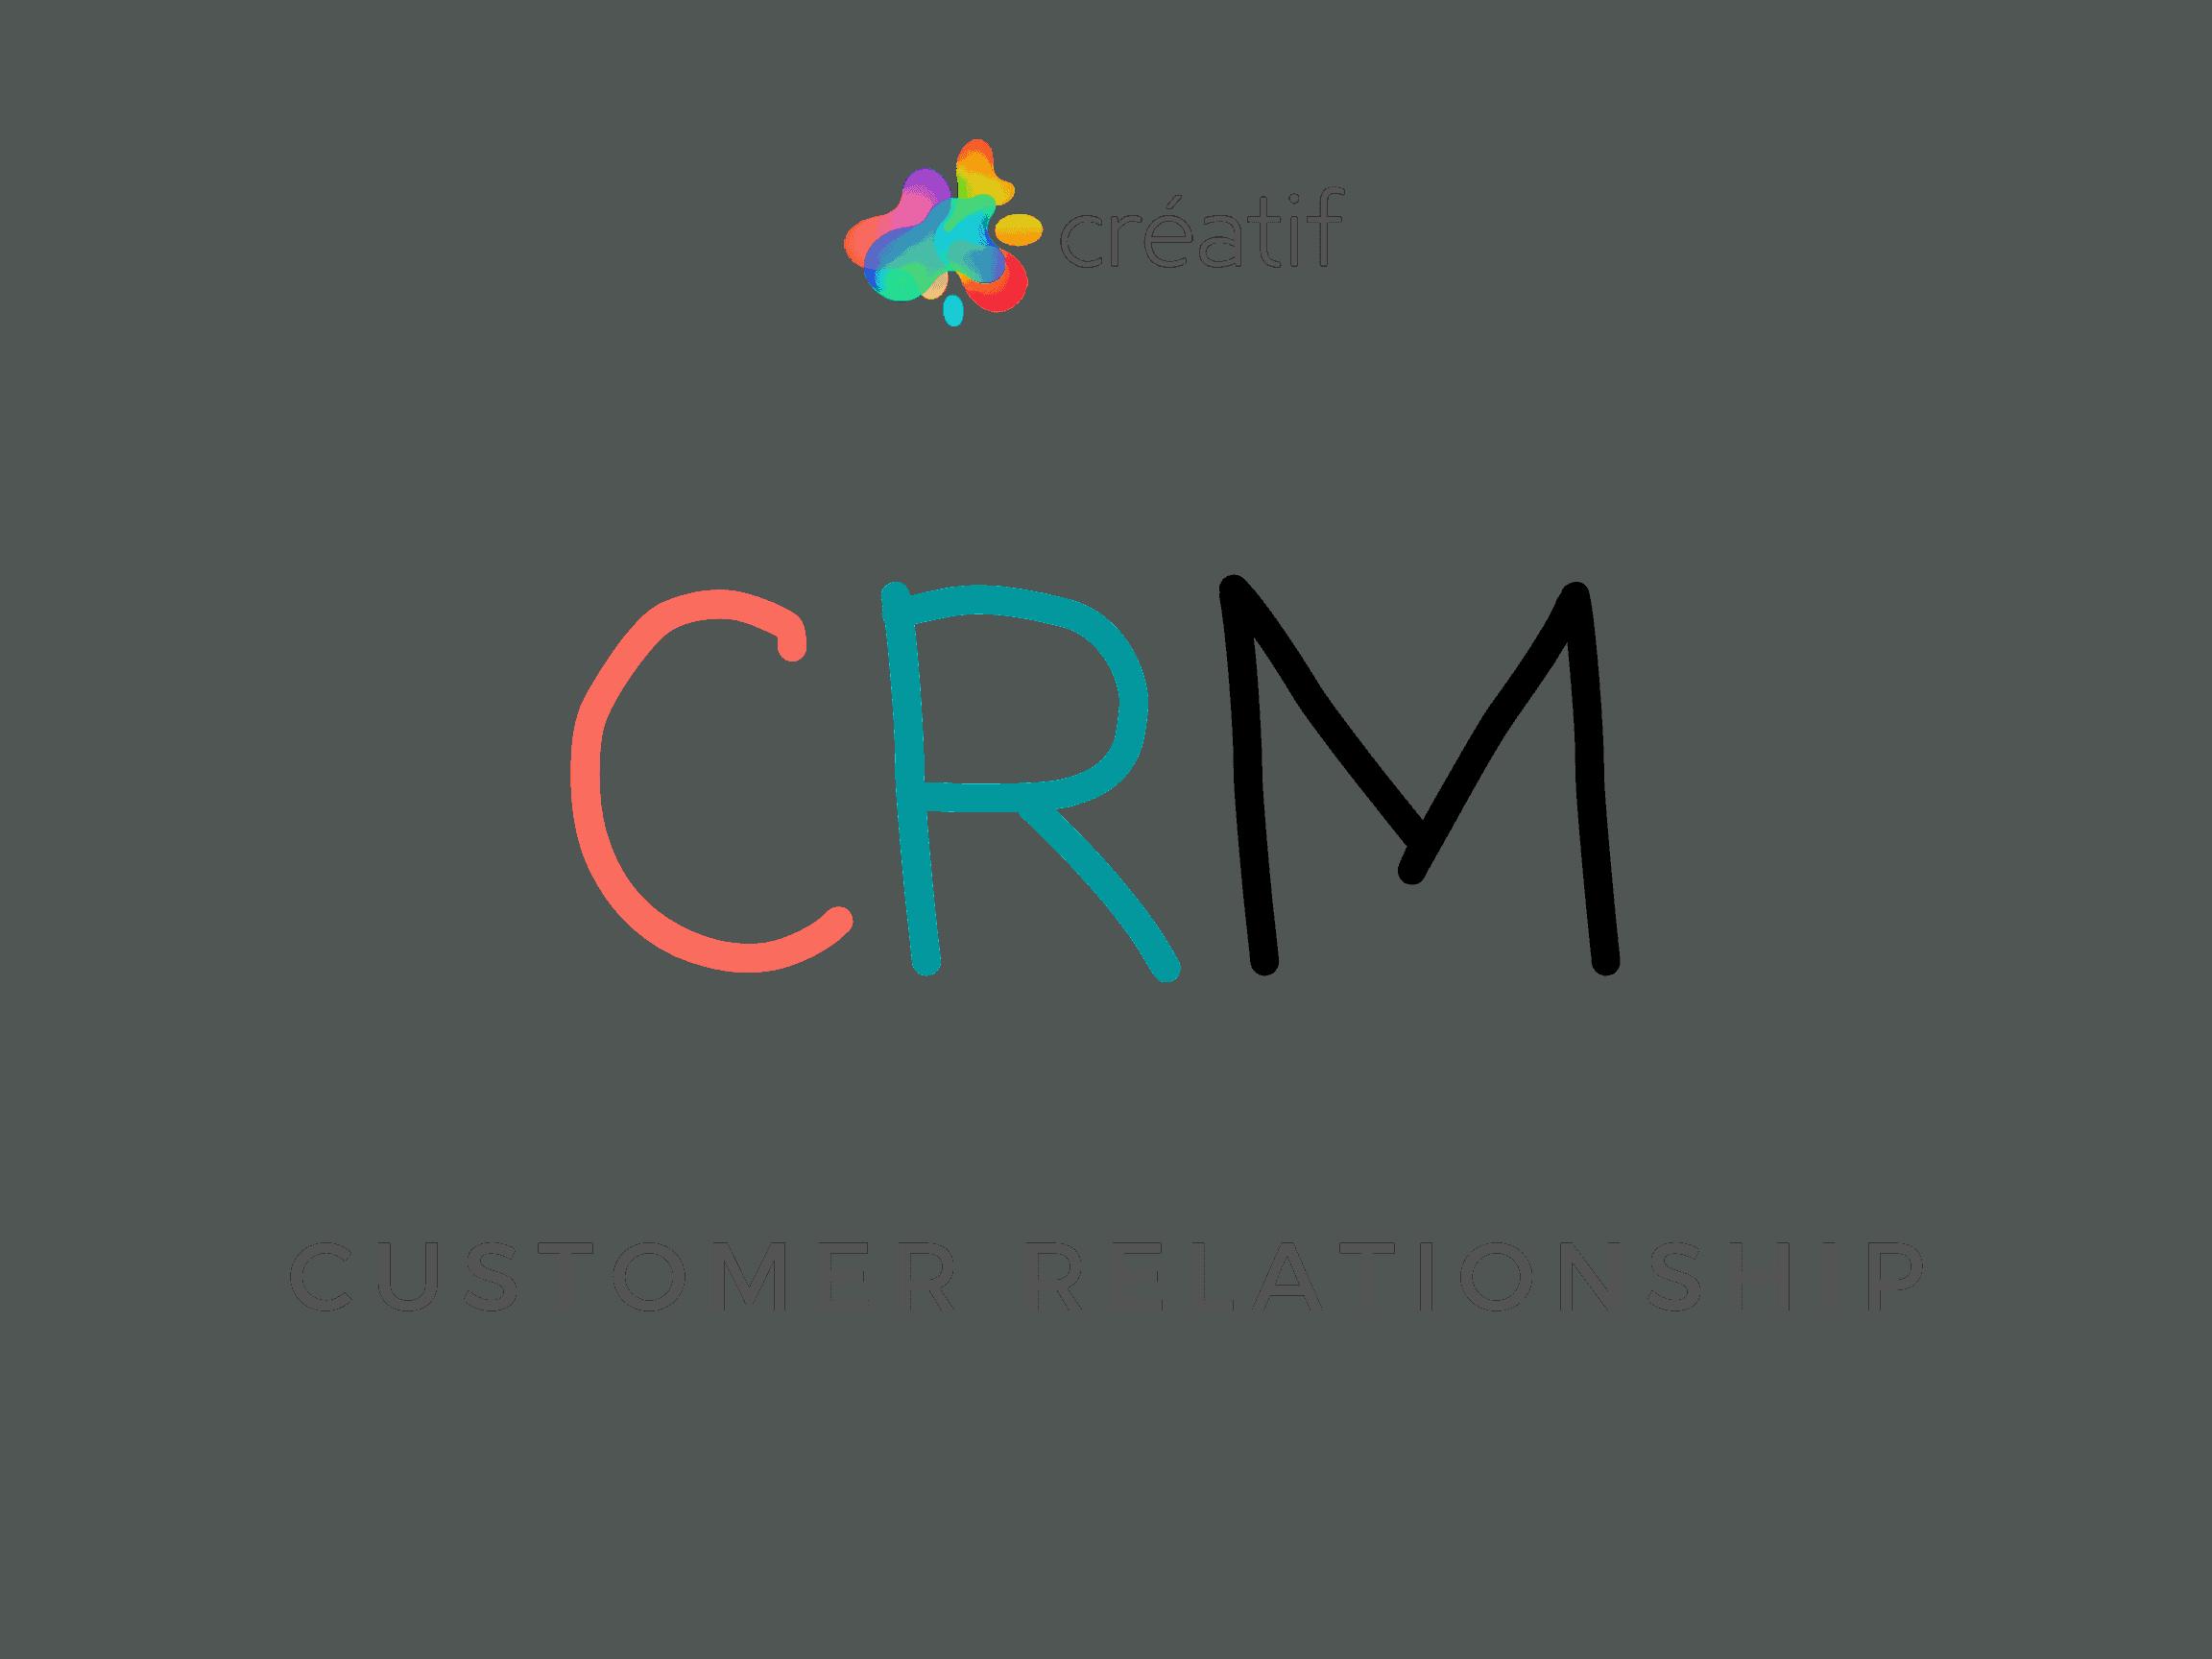 Creatif Franchising CRM